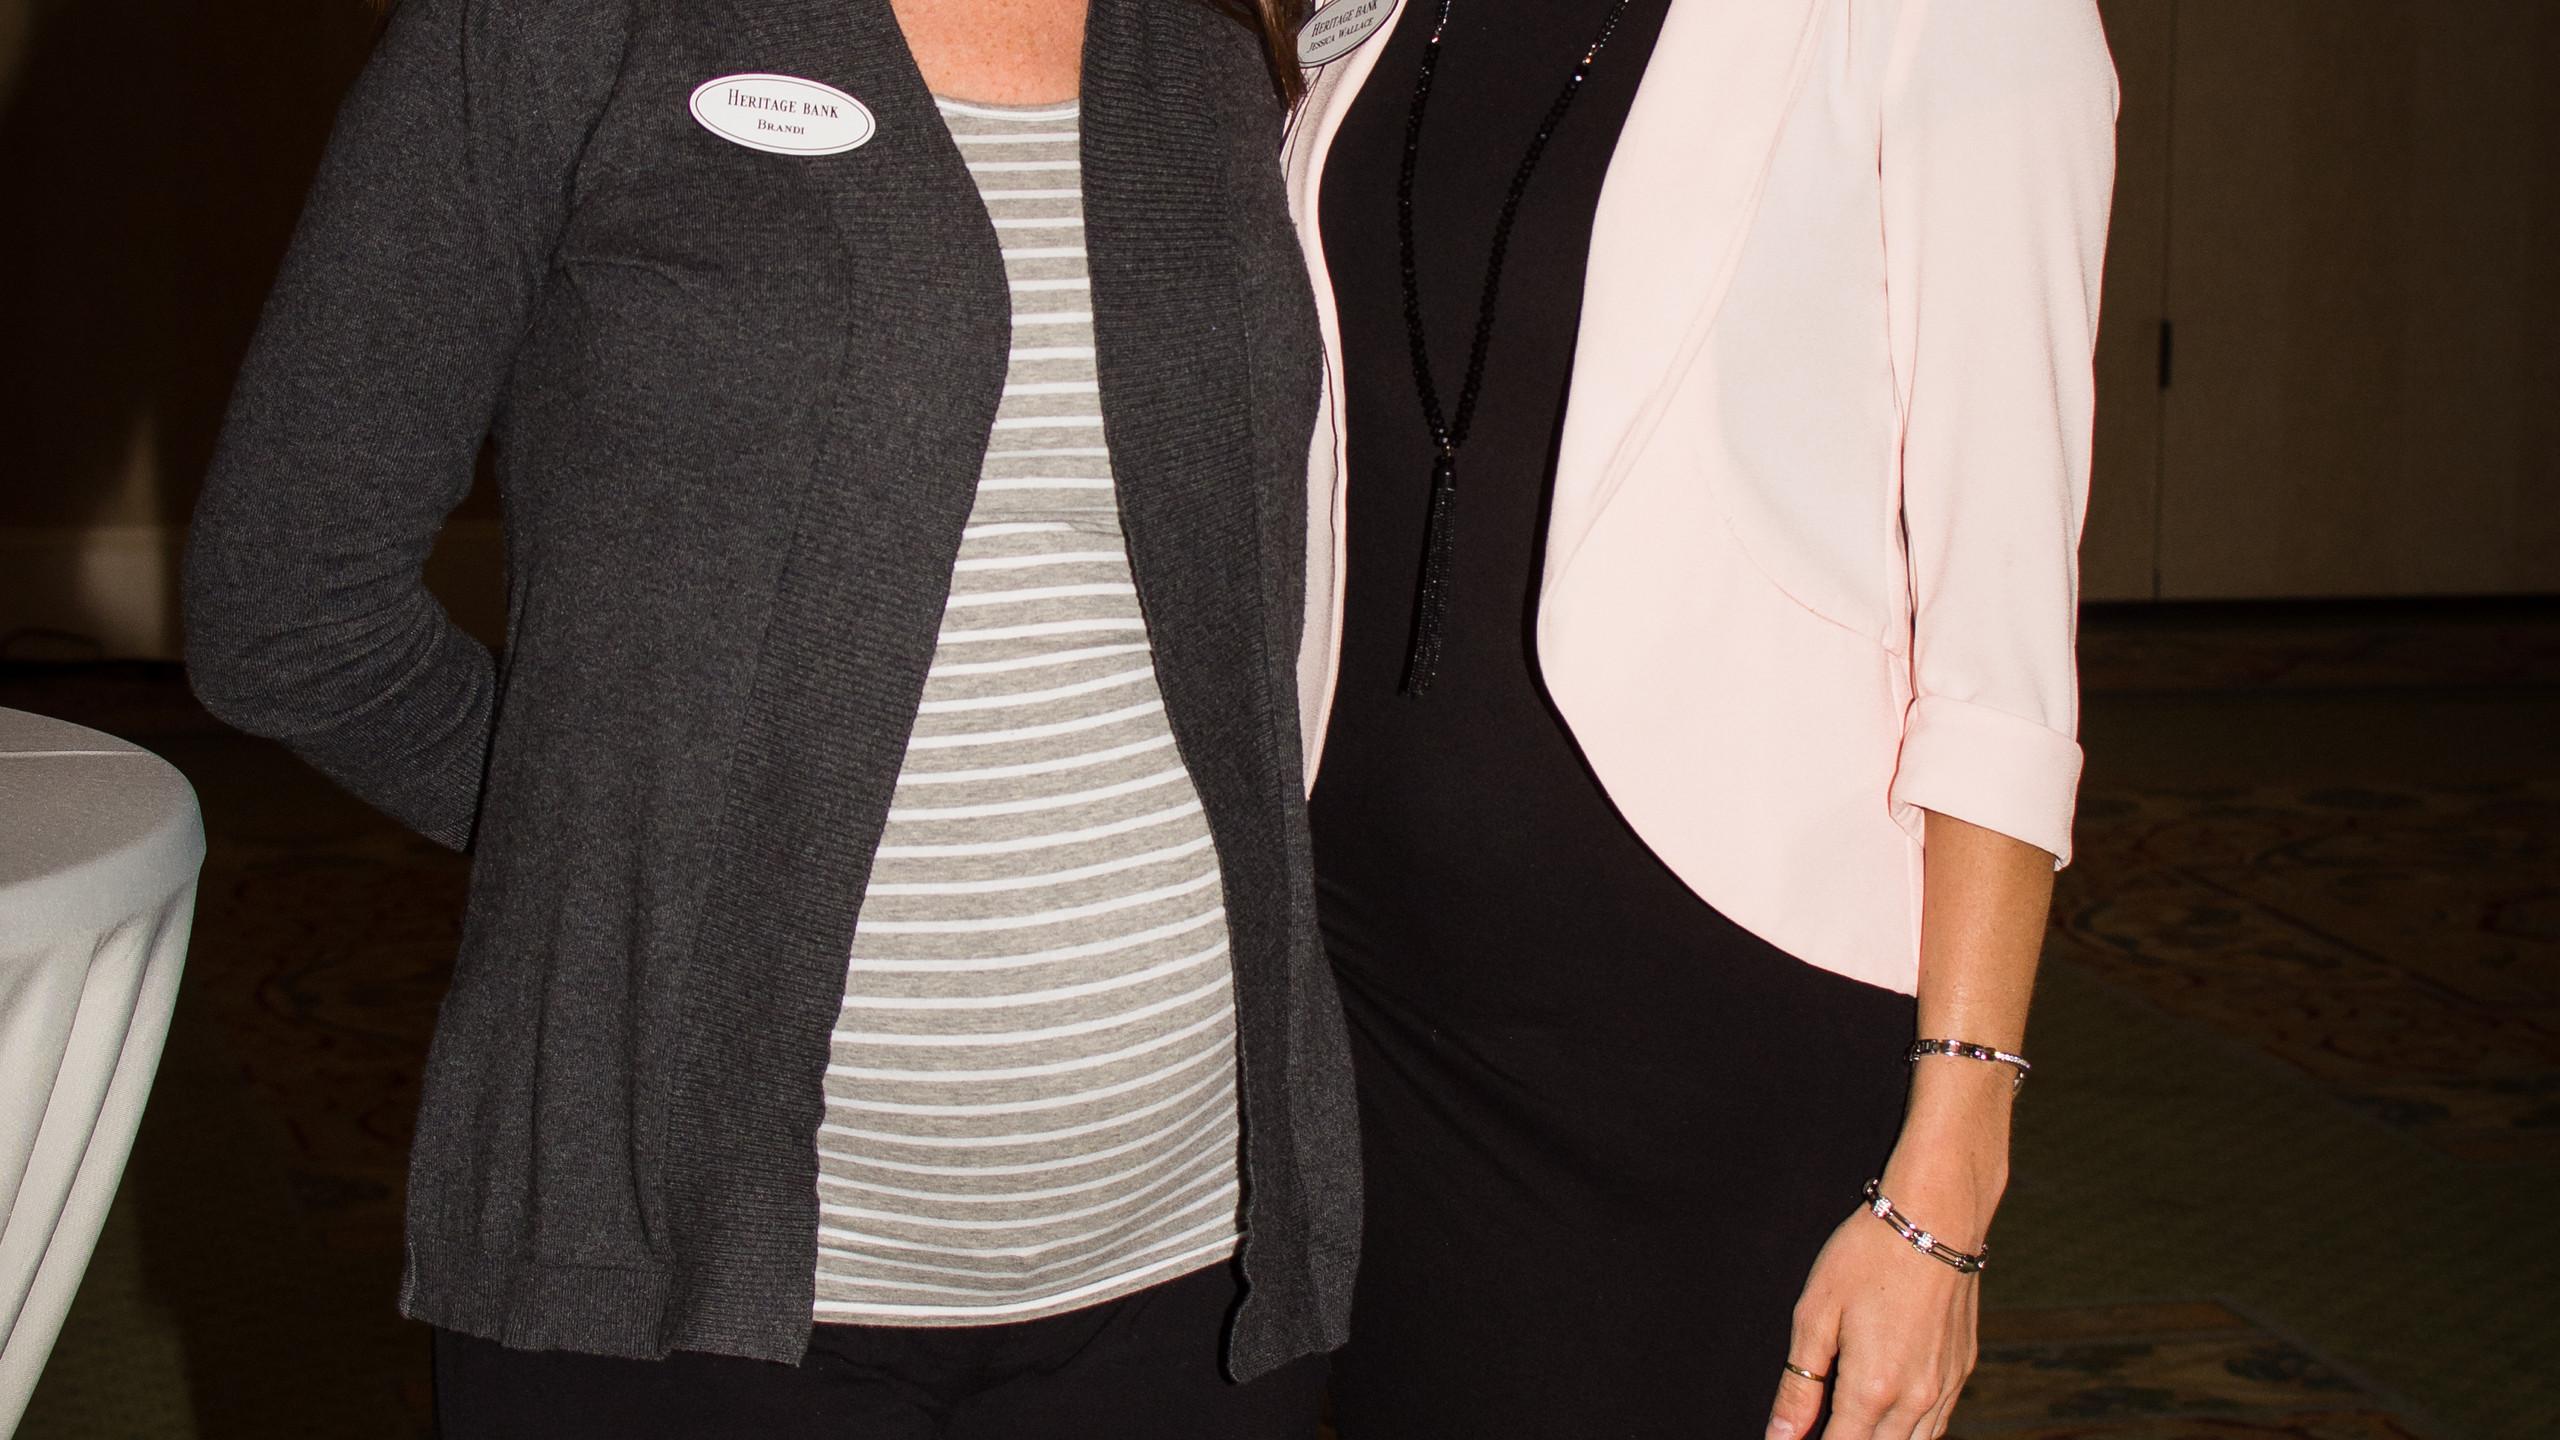 Brandi Conaster and Jessica Wallace